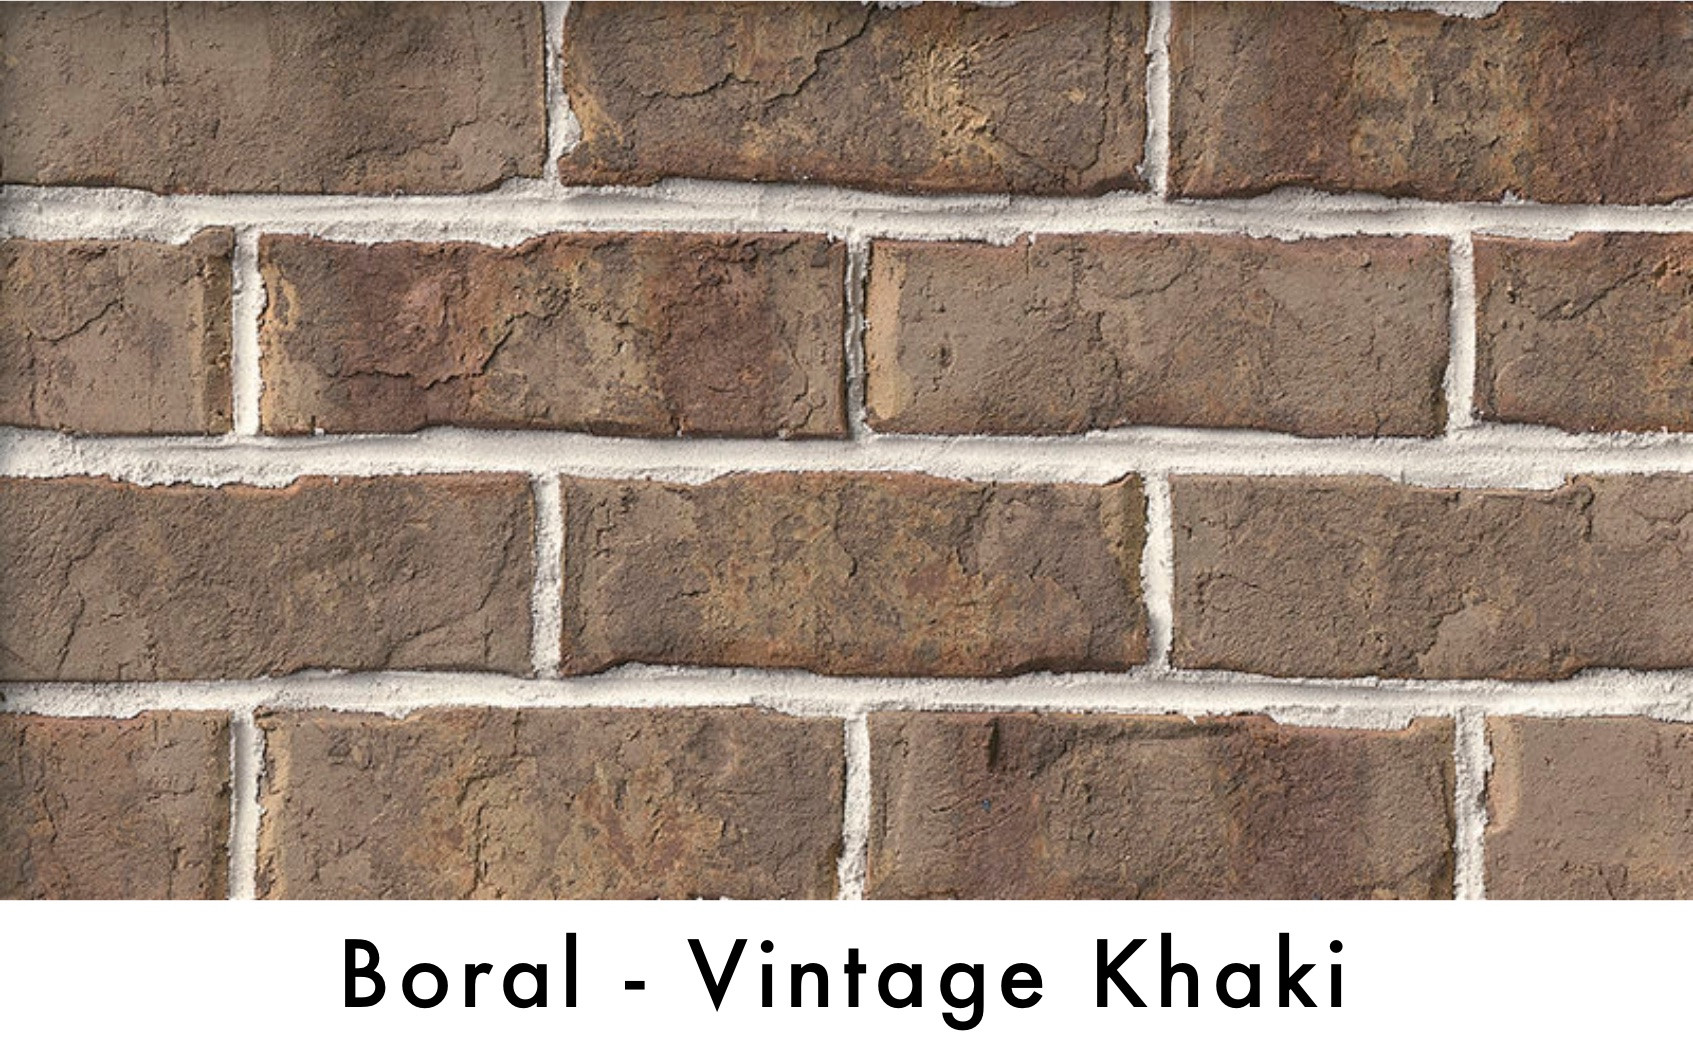 Boral Brick - Vintage Khaki